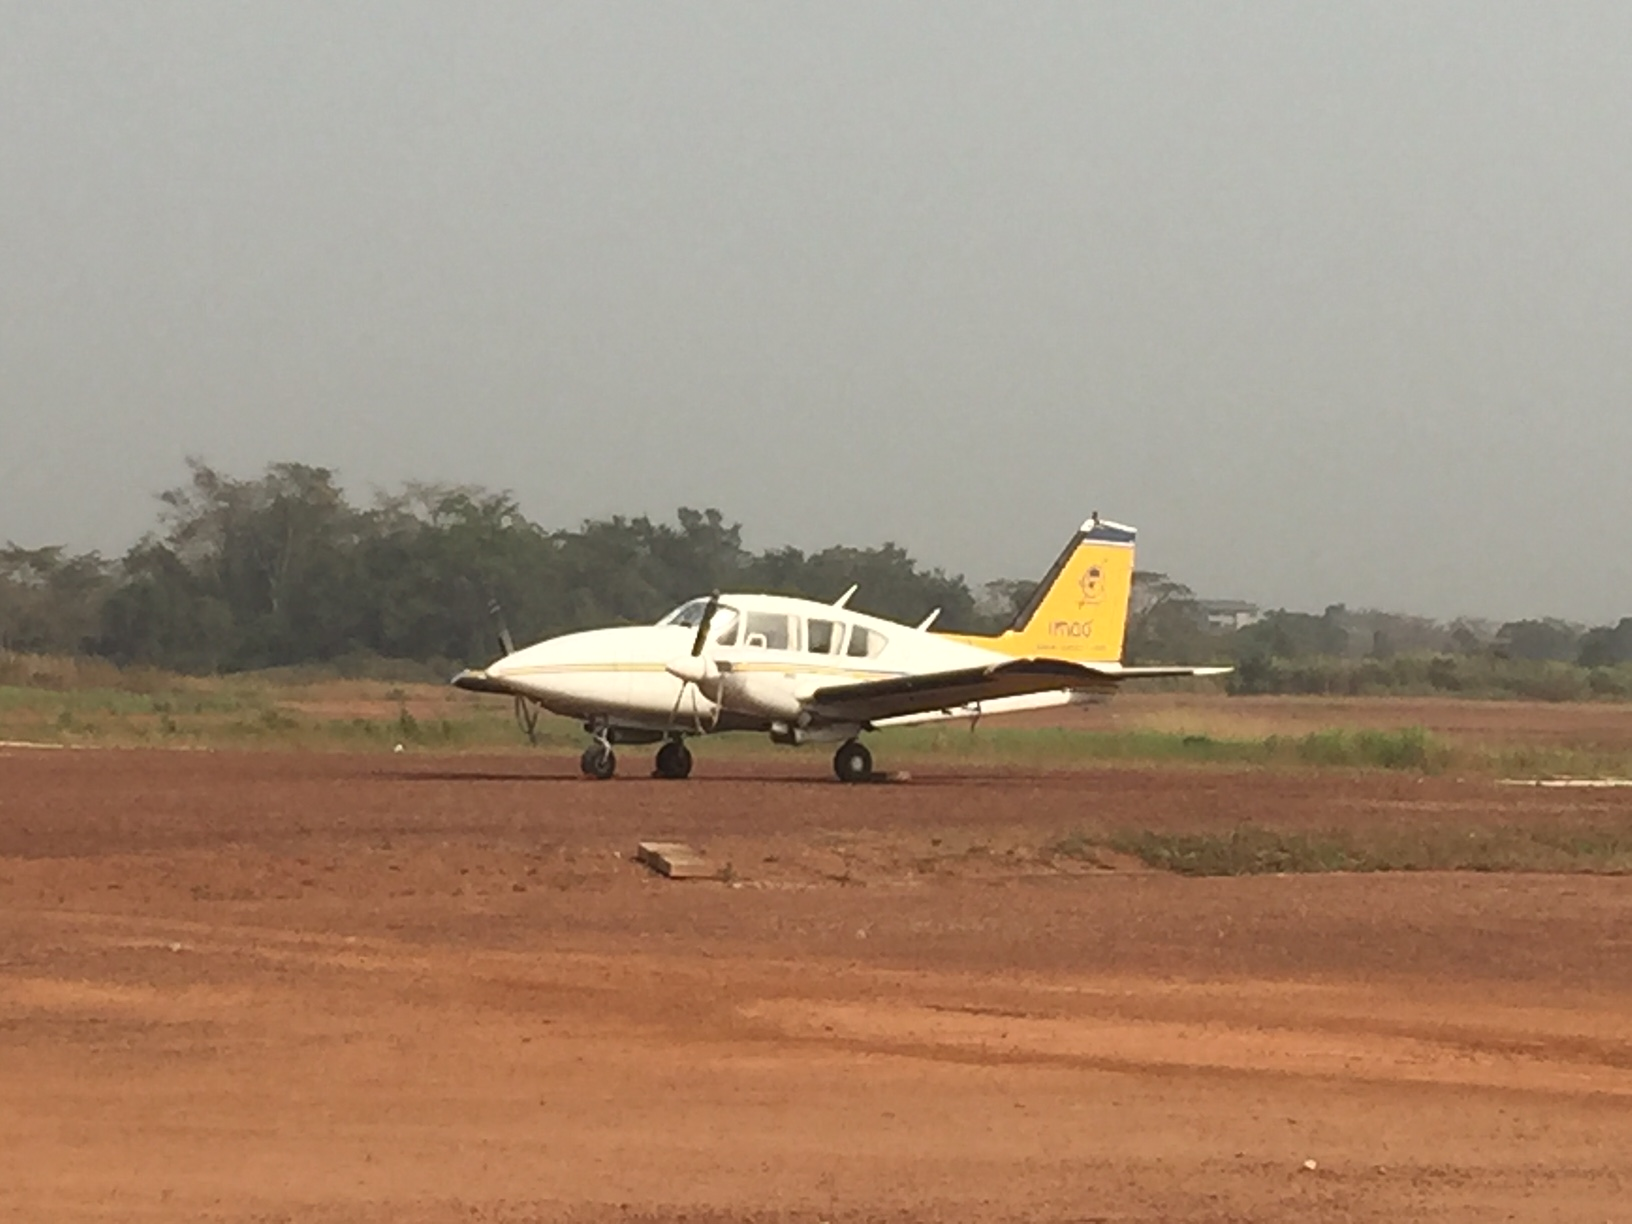 Aircraft parking